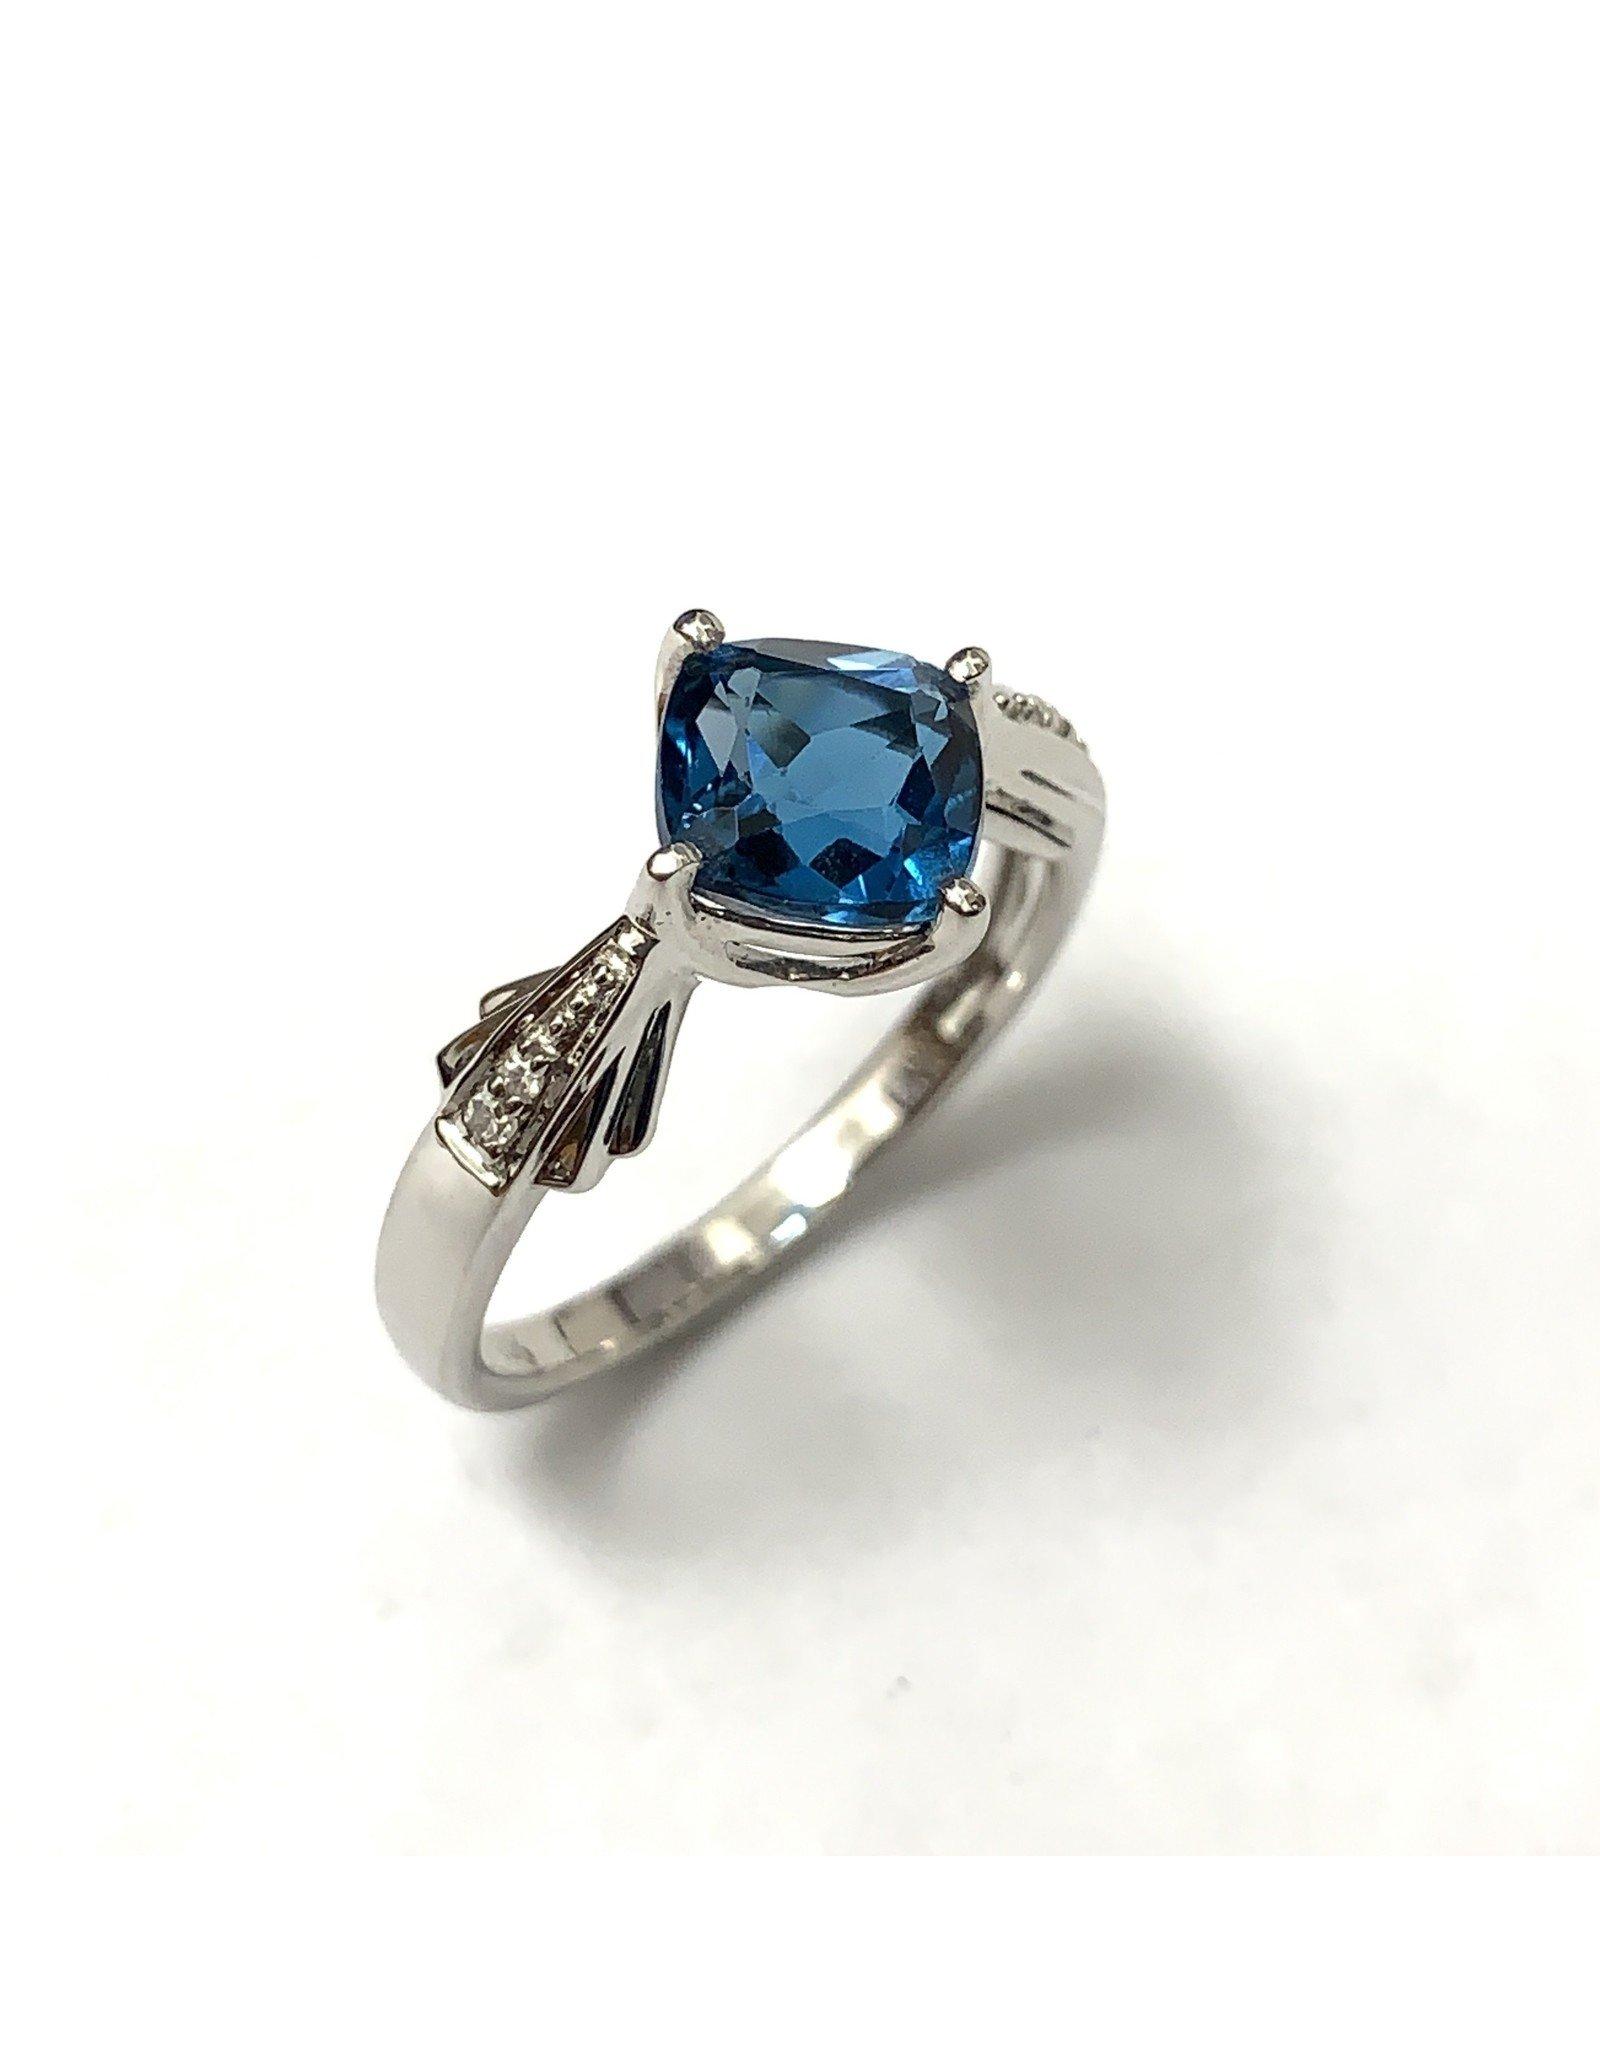 Topaz & Diamond Ring 10KW